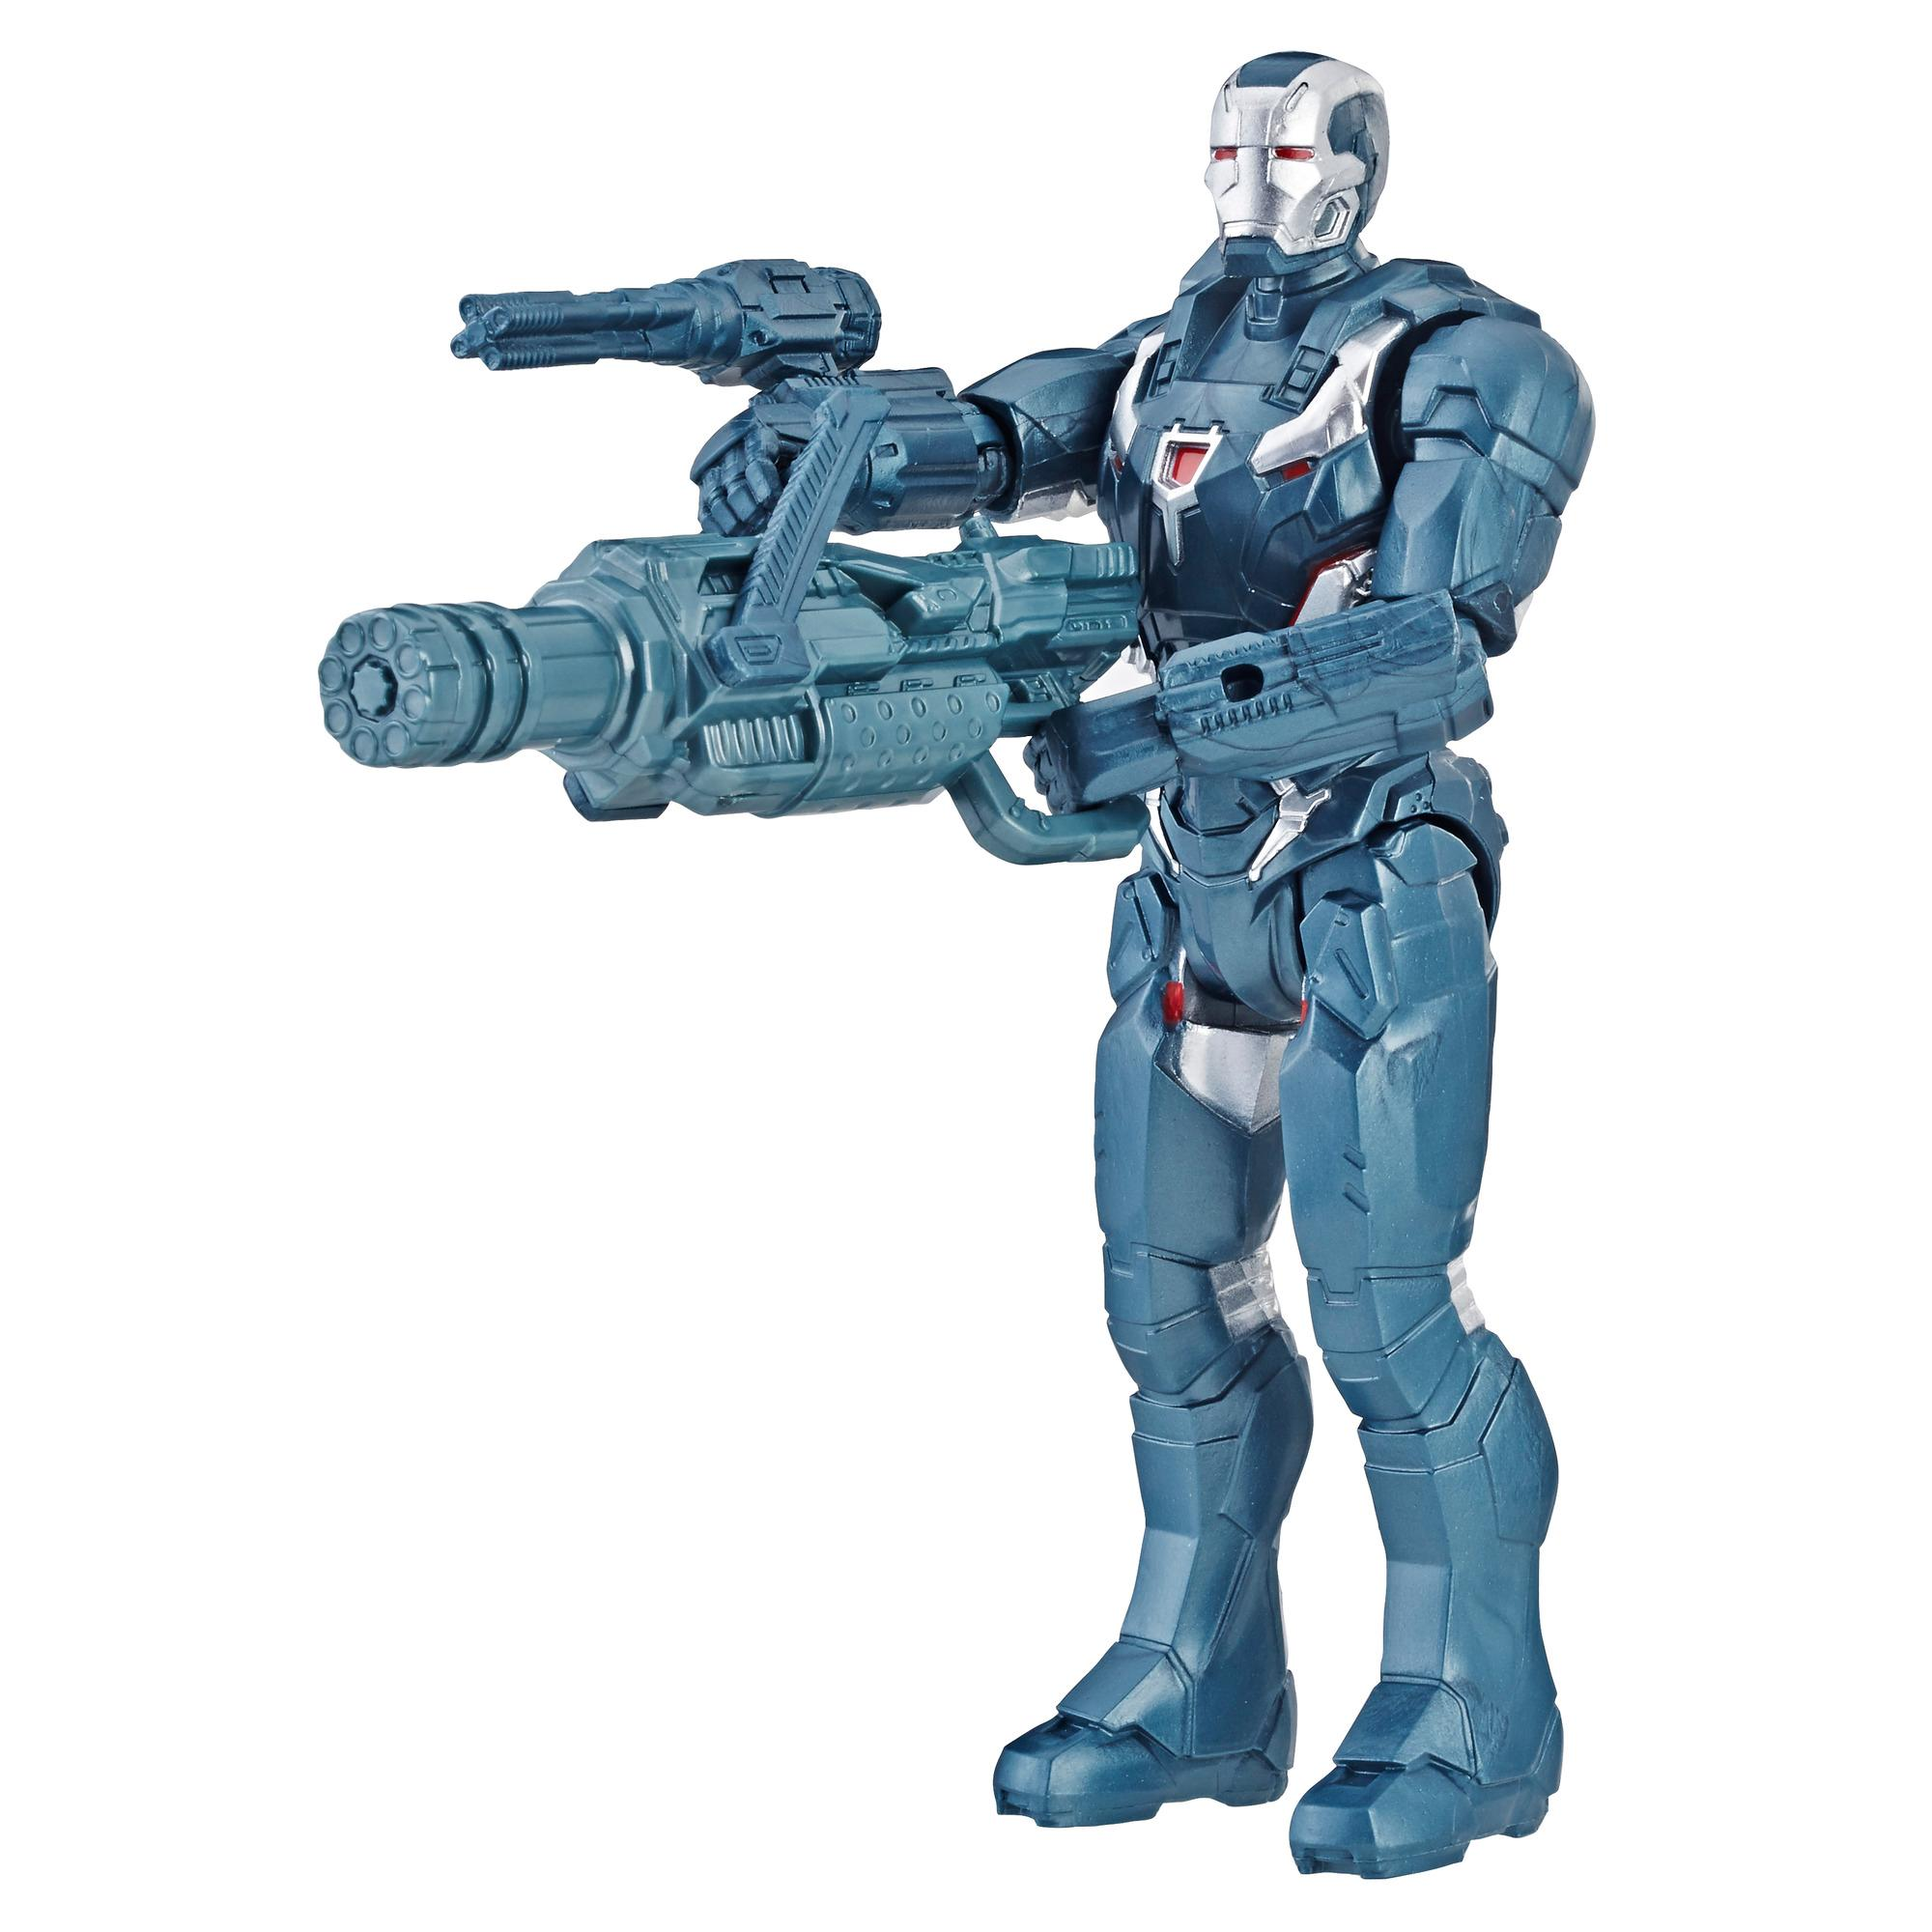 Avengers Endgame 6 Inch War Machine